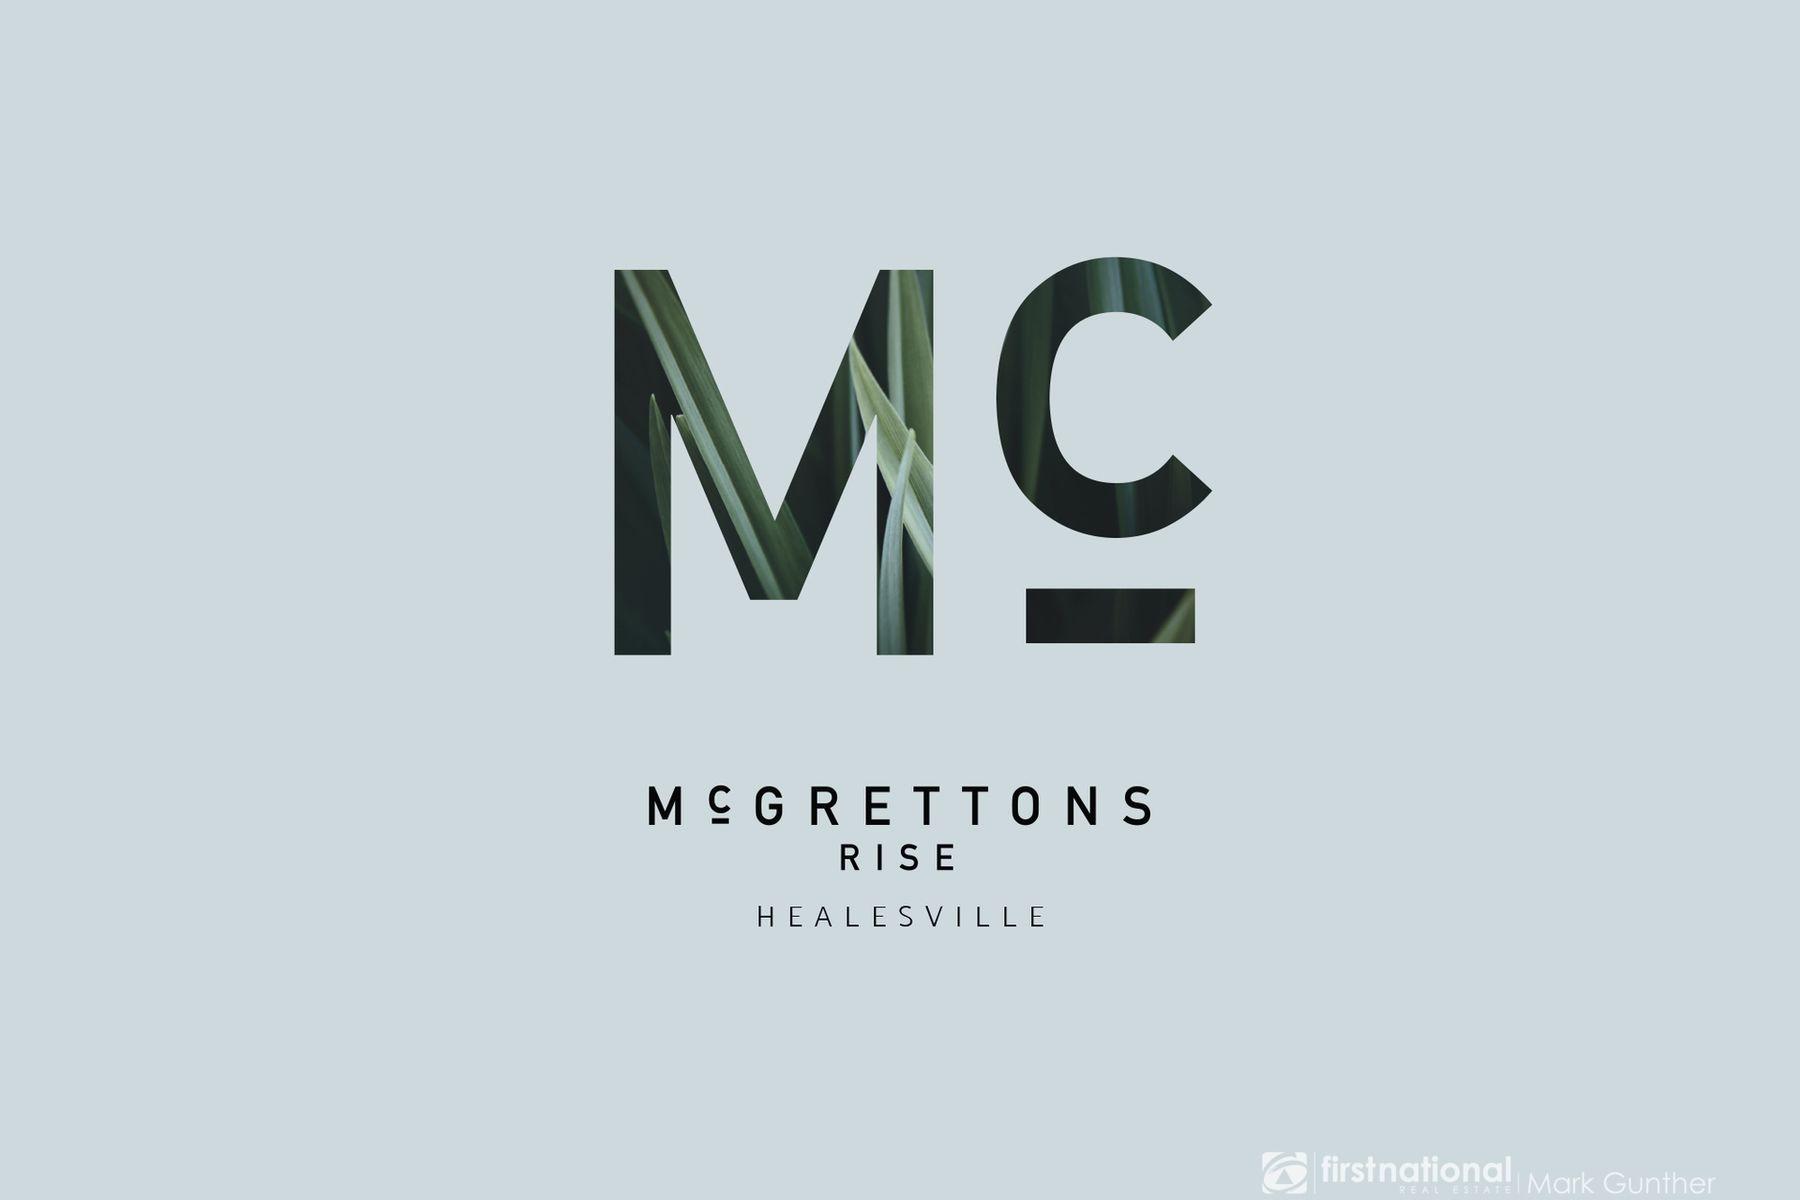 Lot 13/29 Mcgrettons Road, Healesville, VIC 3777